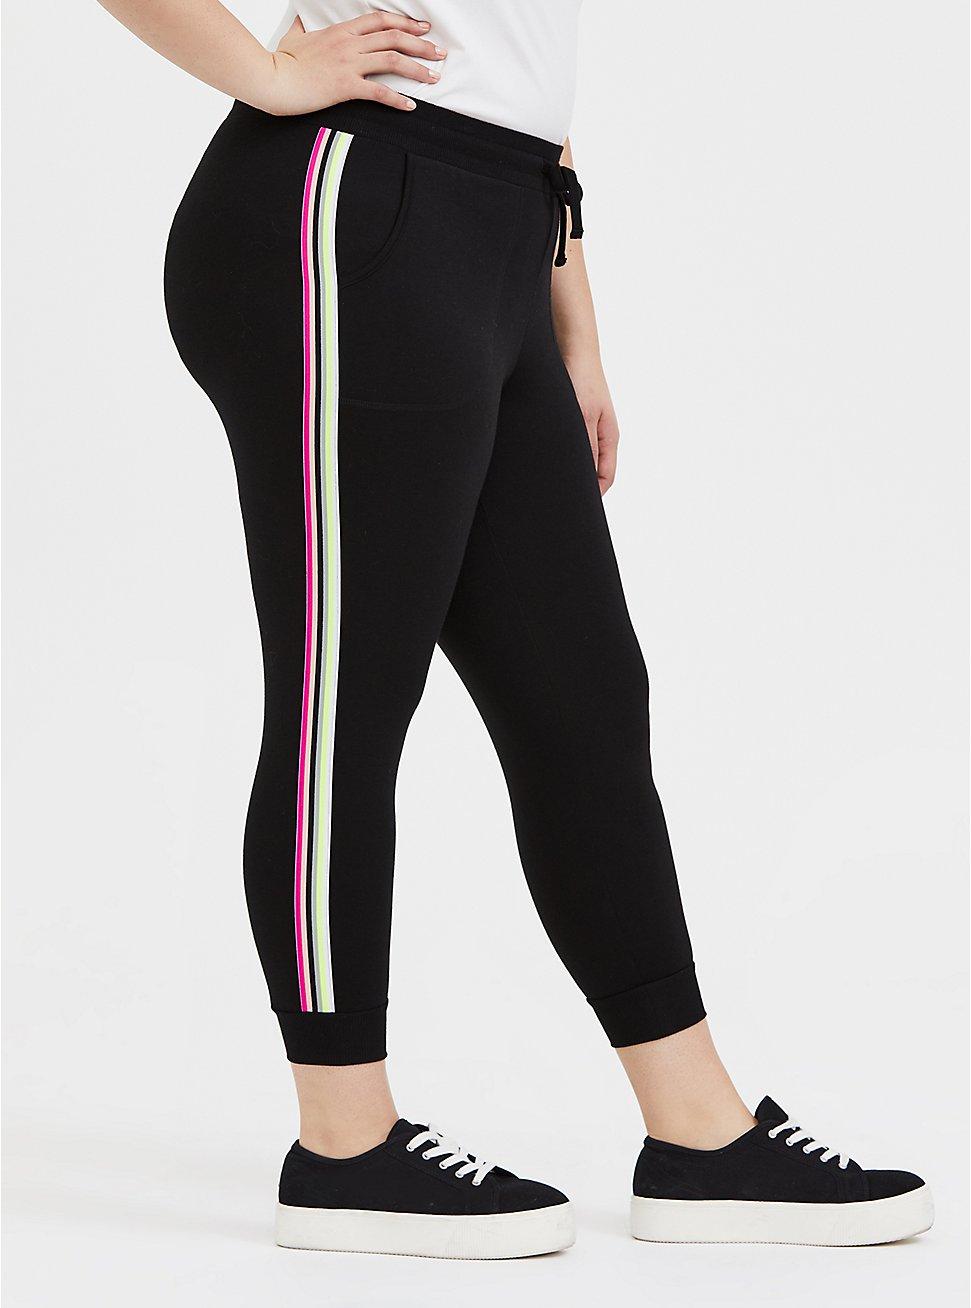 Black & Neon Stripe Terry Crop Active Jogger, DEEP BLACK, hi-res